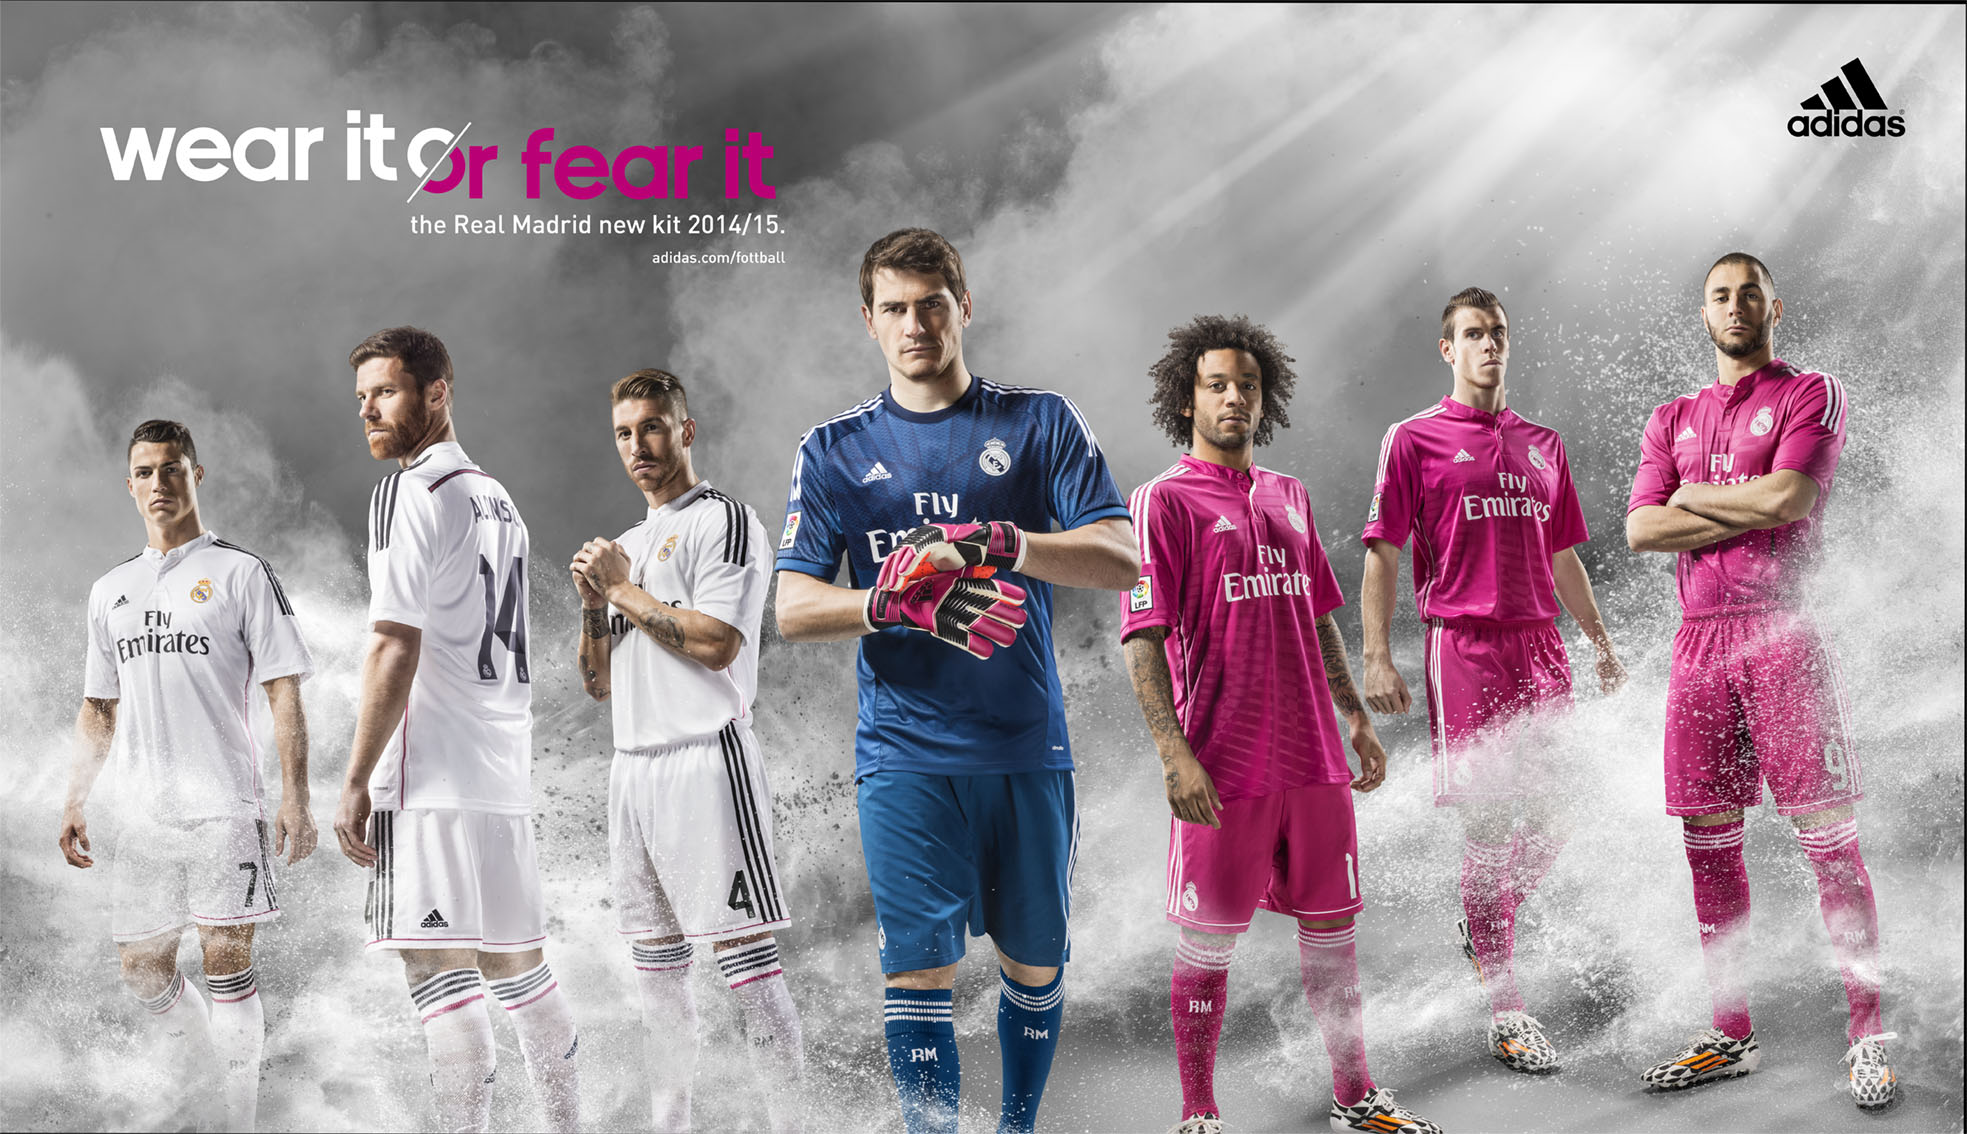 b football grupo_adidas.jpg